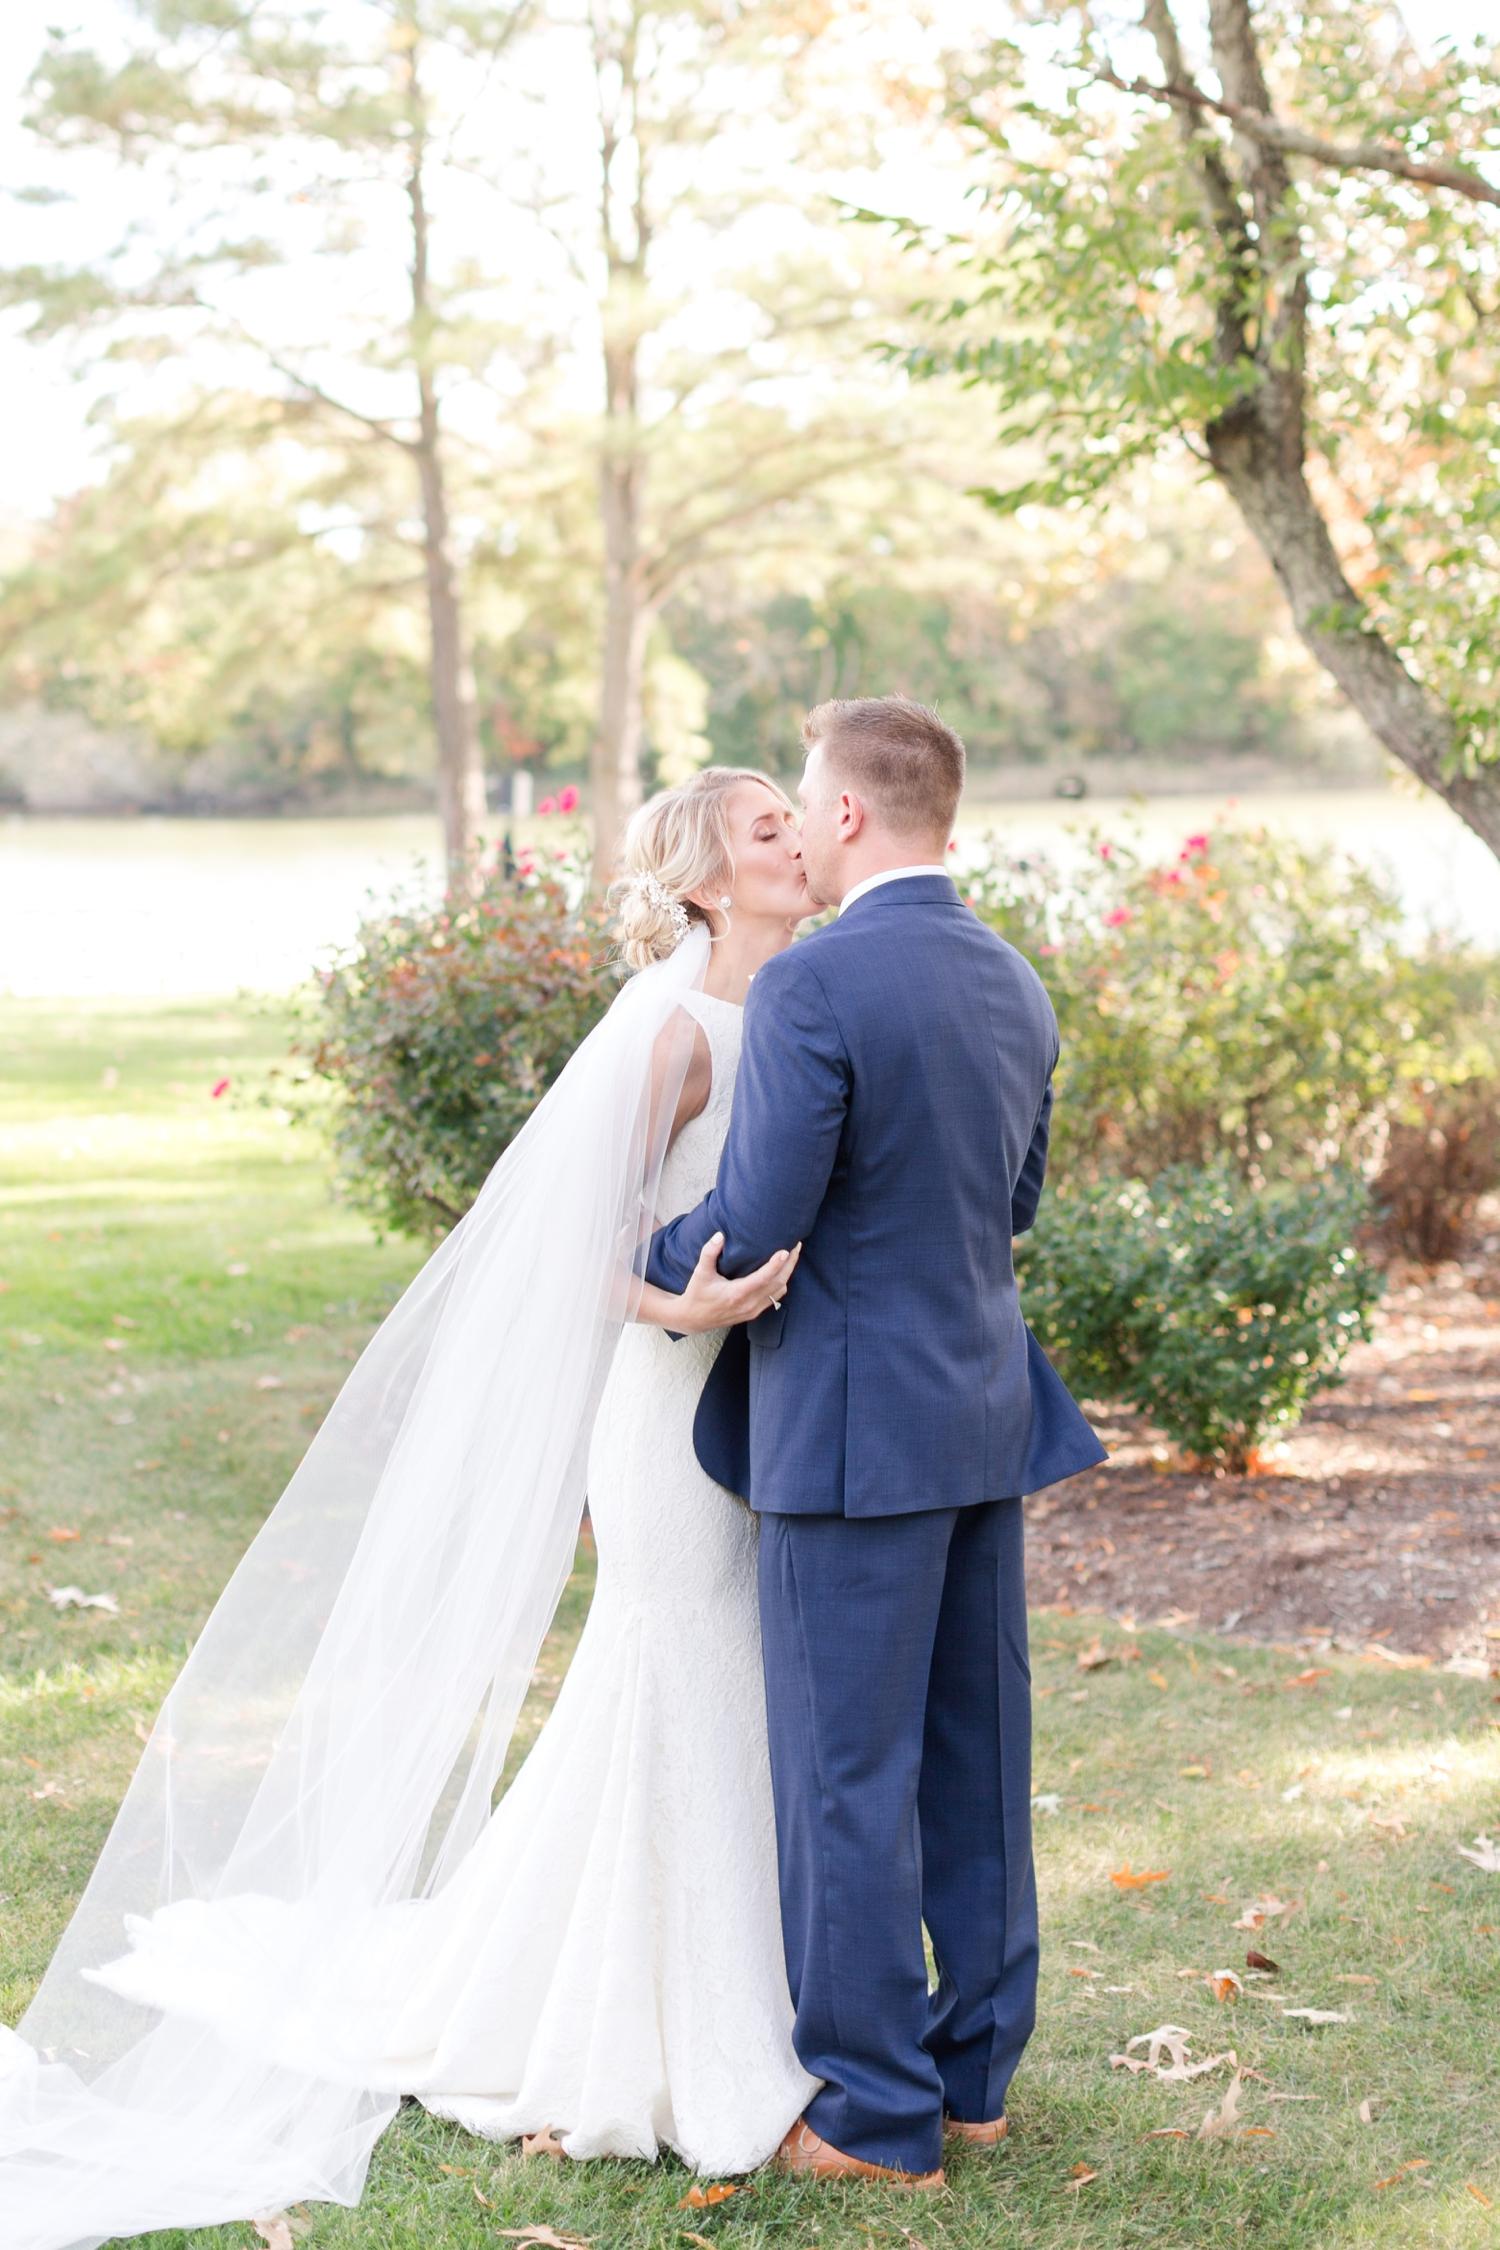 Wojciechowski Wedding-155_the-oaks-waterfront-inn-wedding-easton-maryland-wedding-photography-anna-grace-photography-photo.jpg